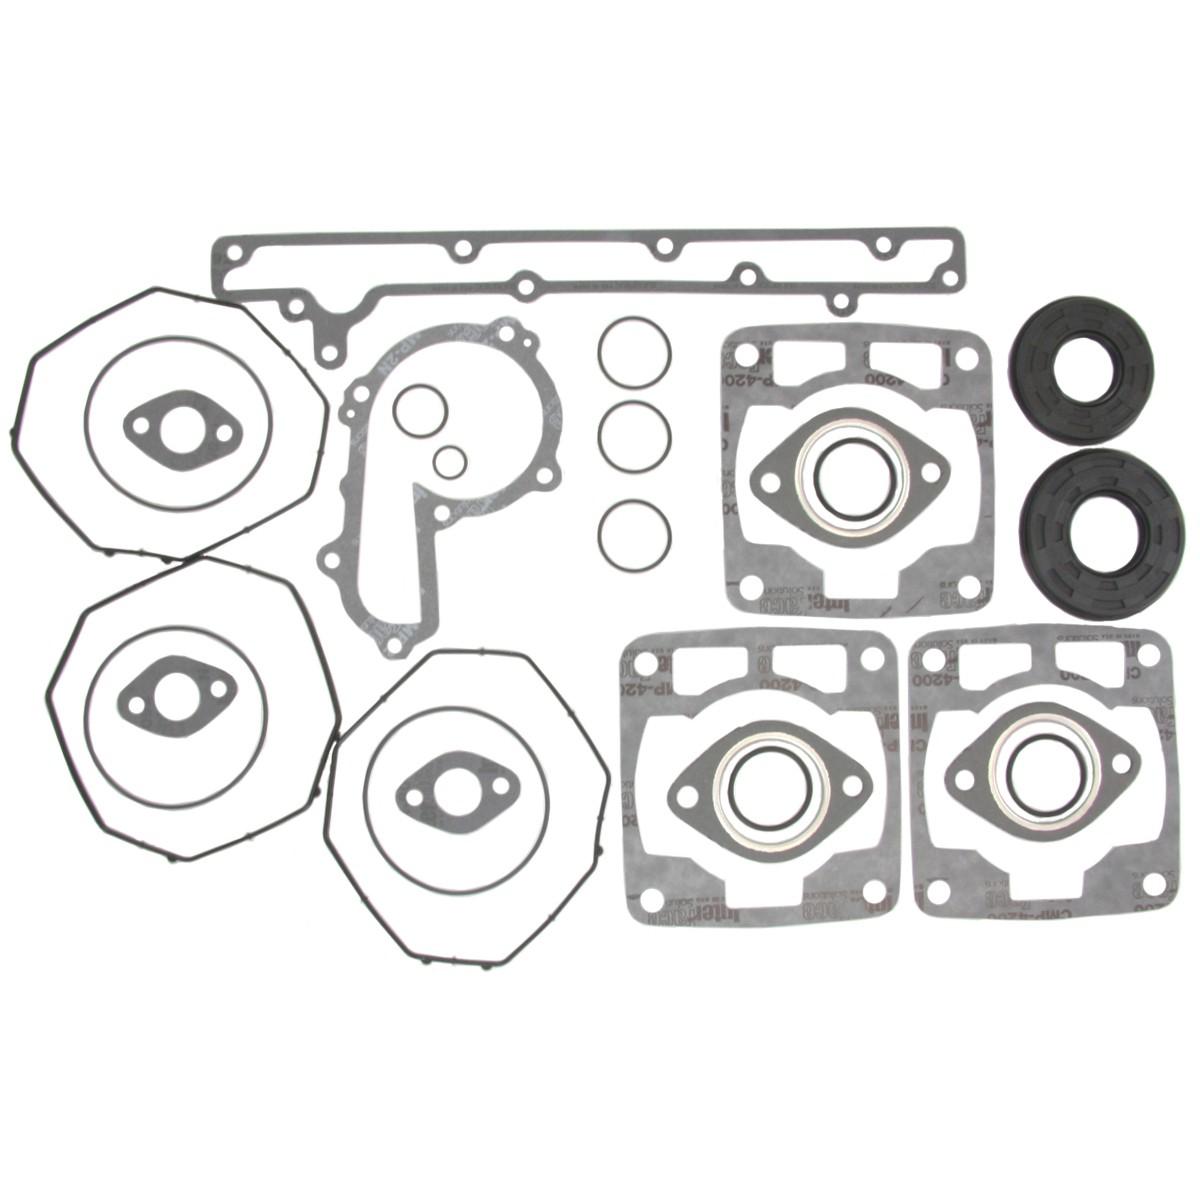 Spi 09 Polaris Full Engine Gasket Set